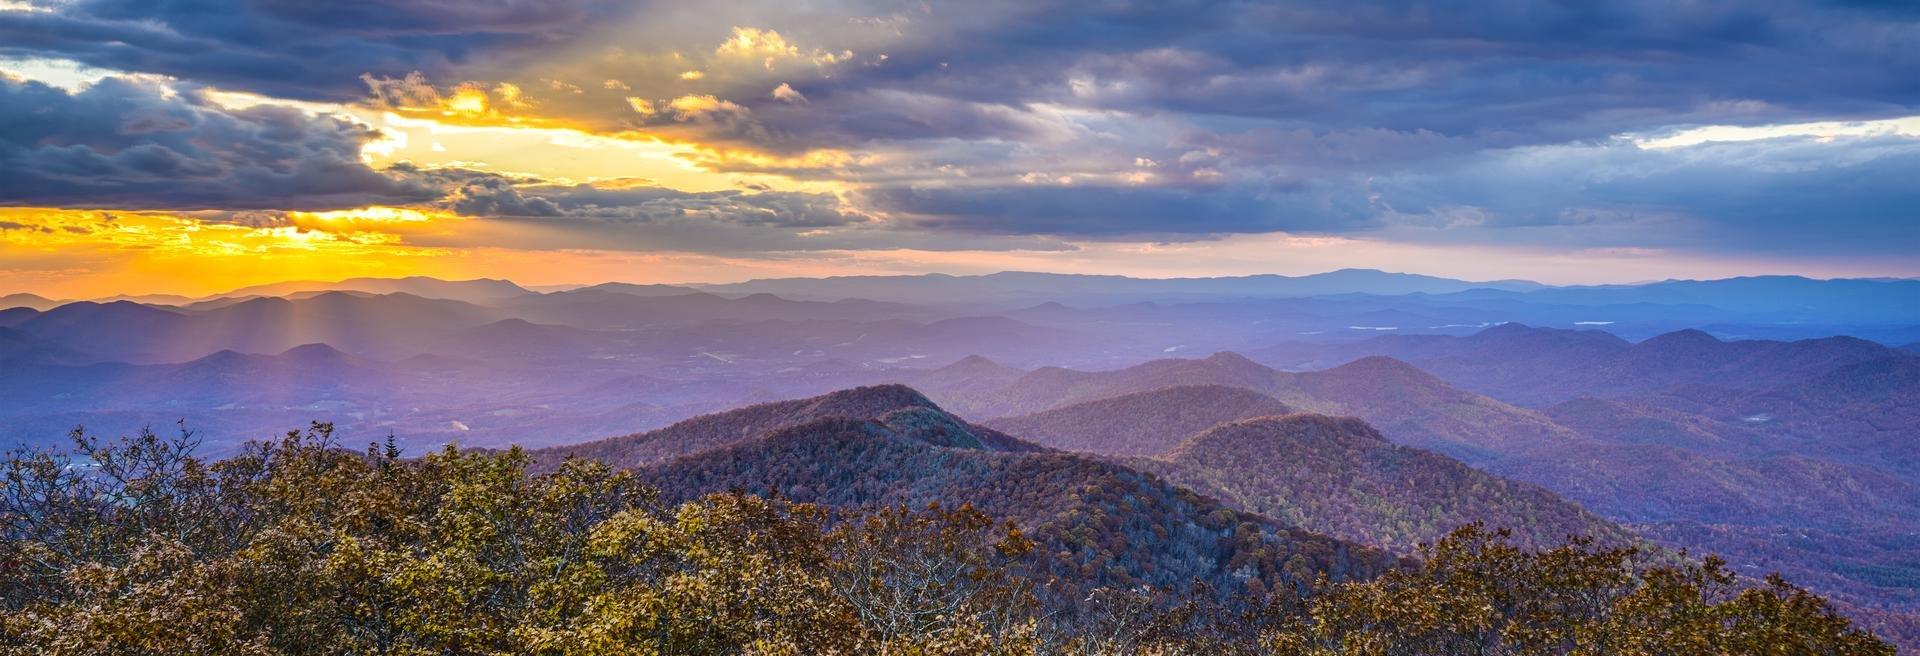 north-georgia-mountains-blue-ridge-shutterstock_213140653